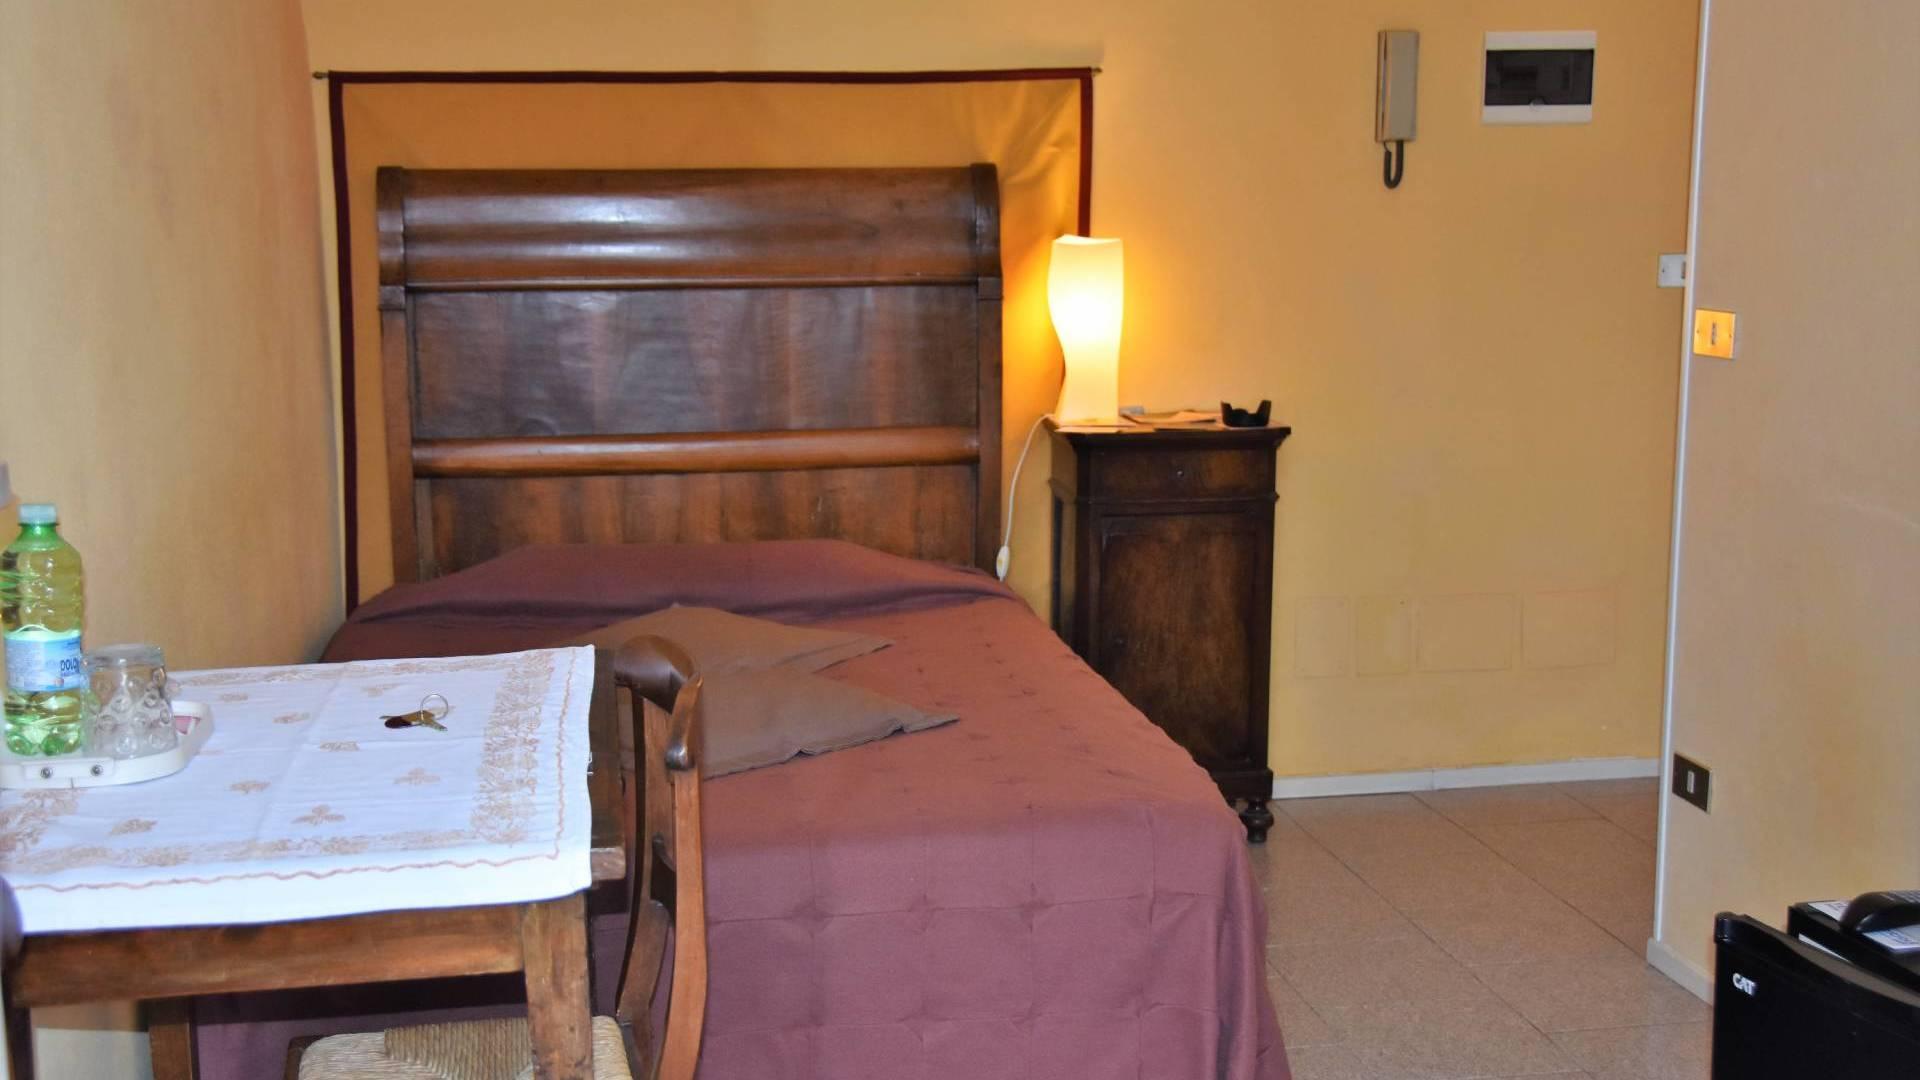 cameravioletta-bebalducale-parma-letto-tavolino-comodinocopertina1920x1080